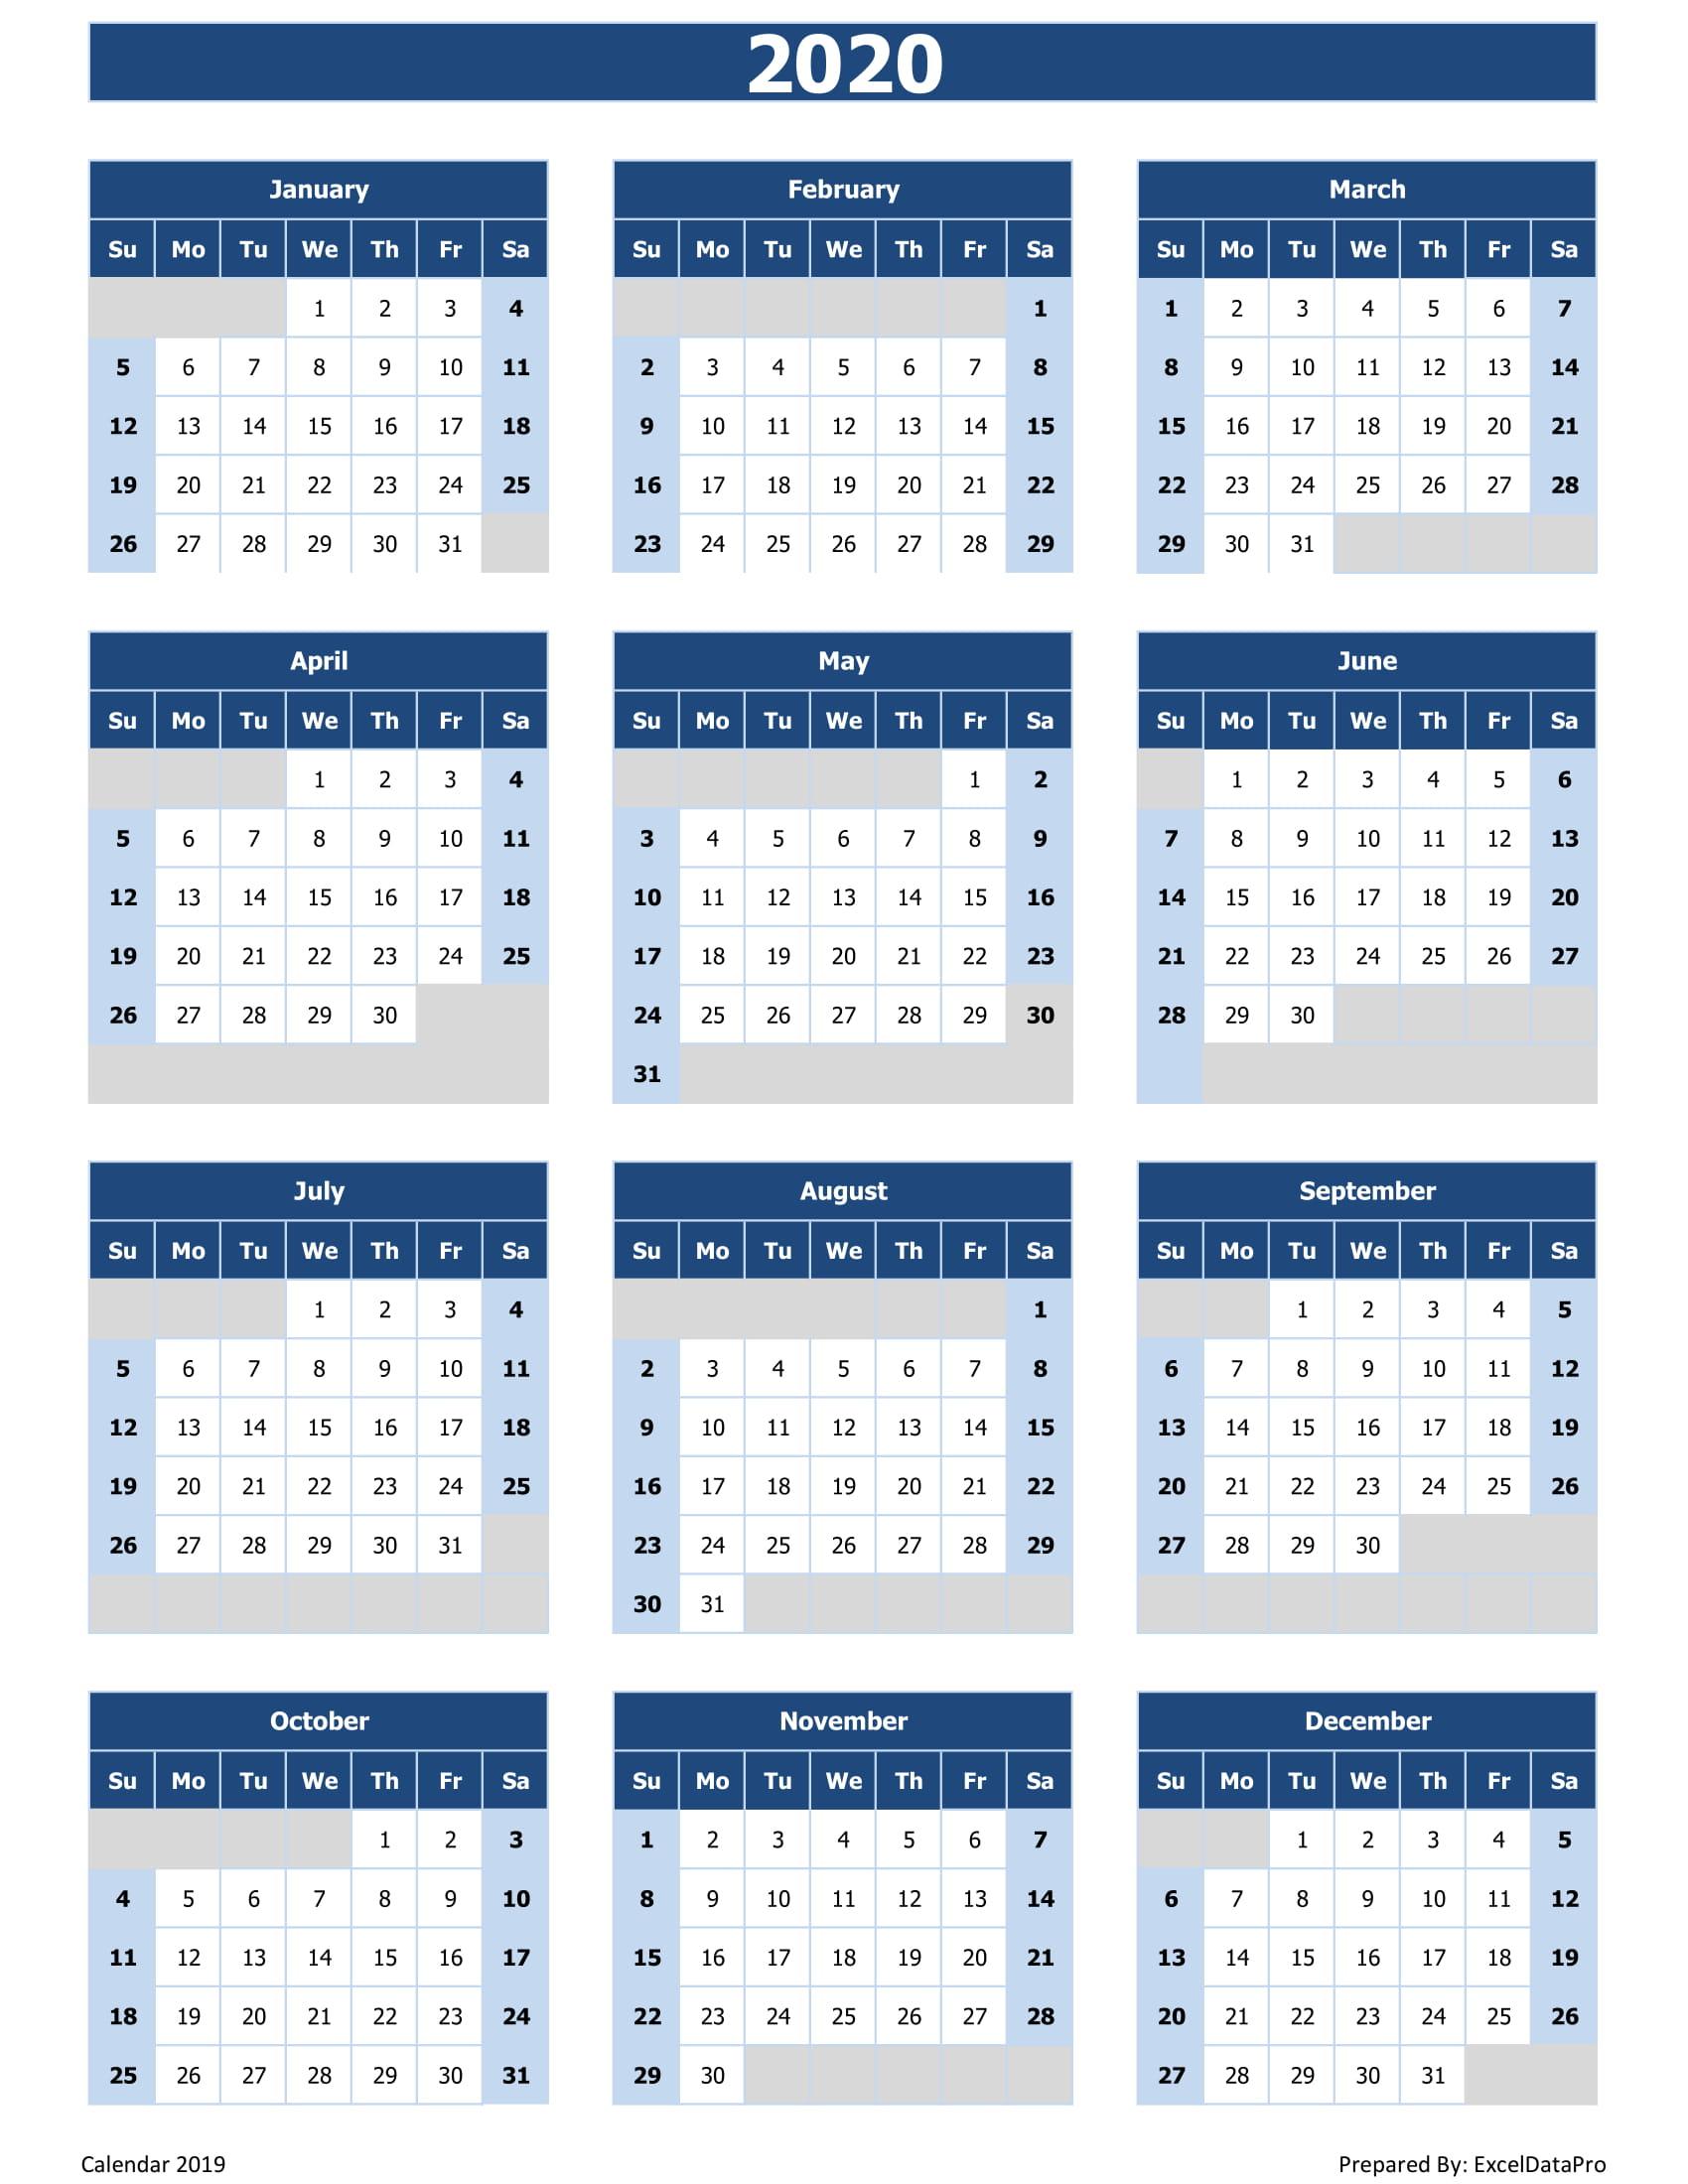 2020 Calendar Excel Templates, Printable Pdfs & Images